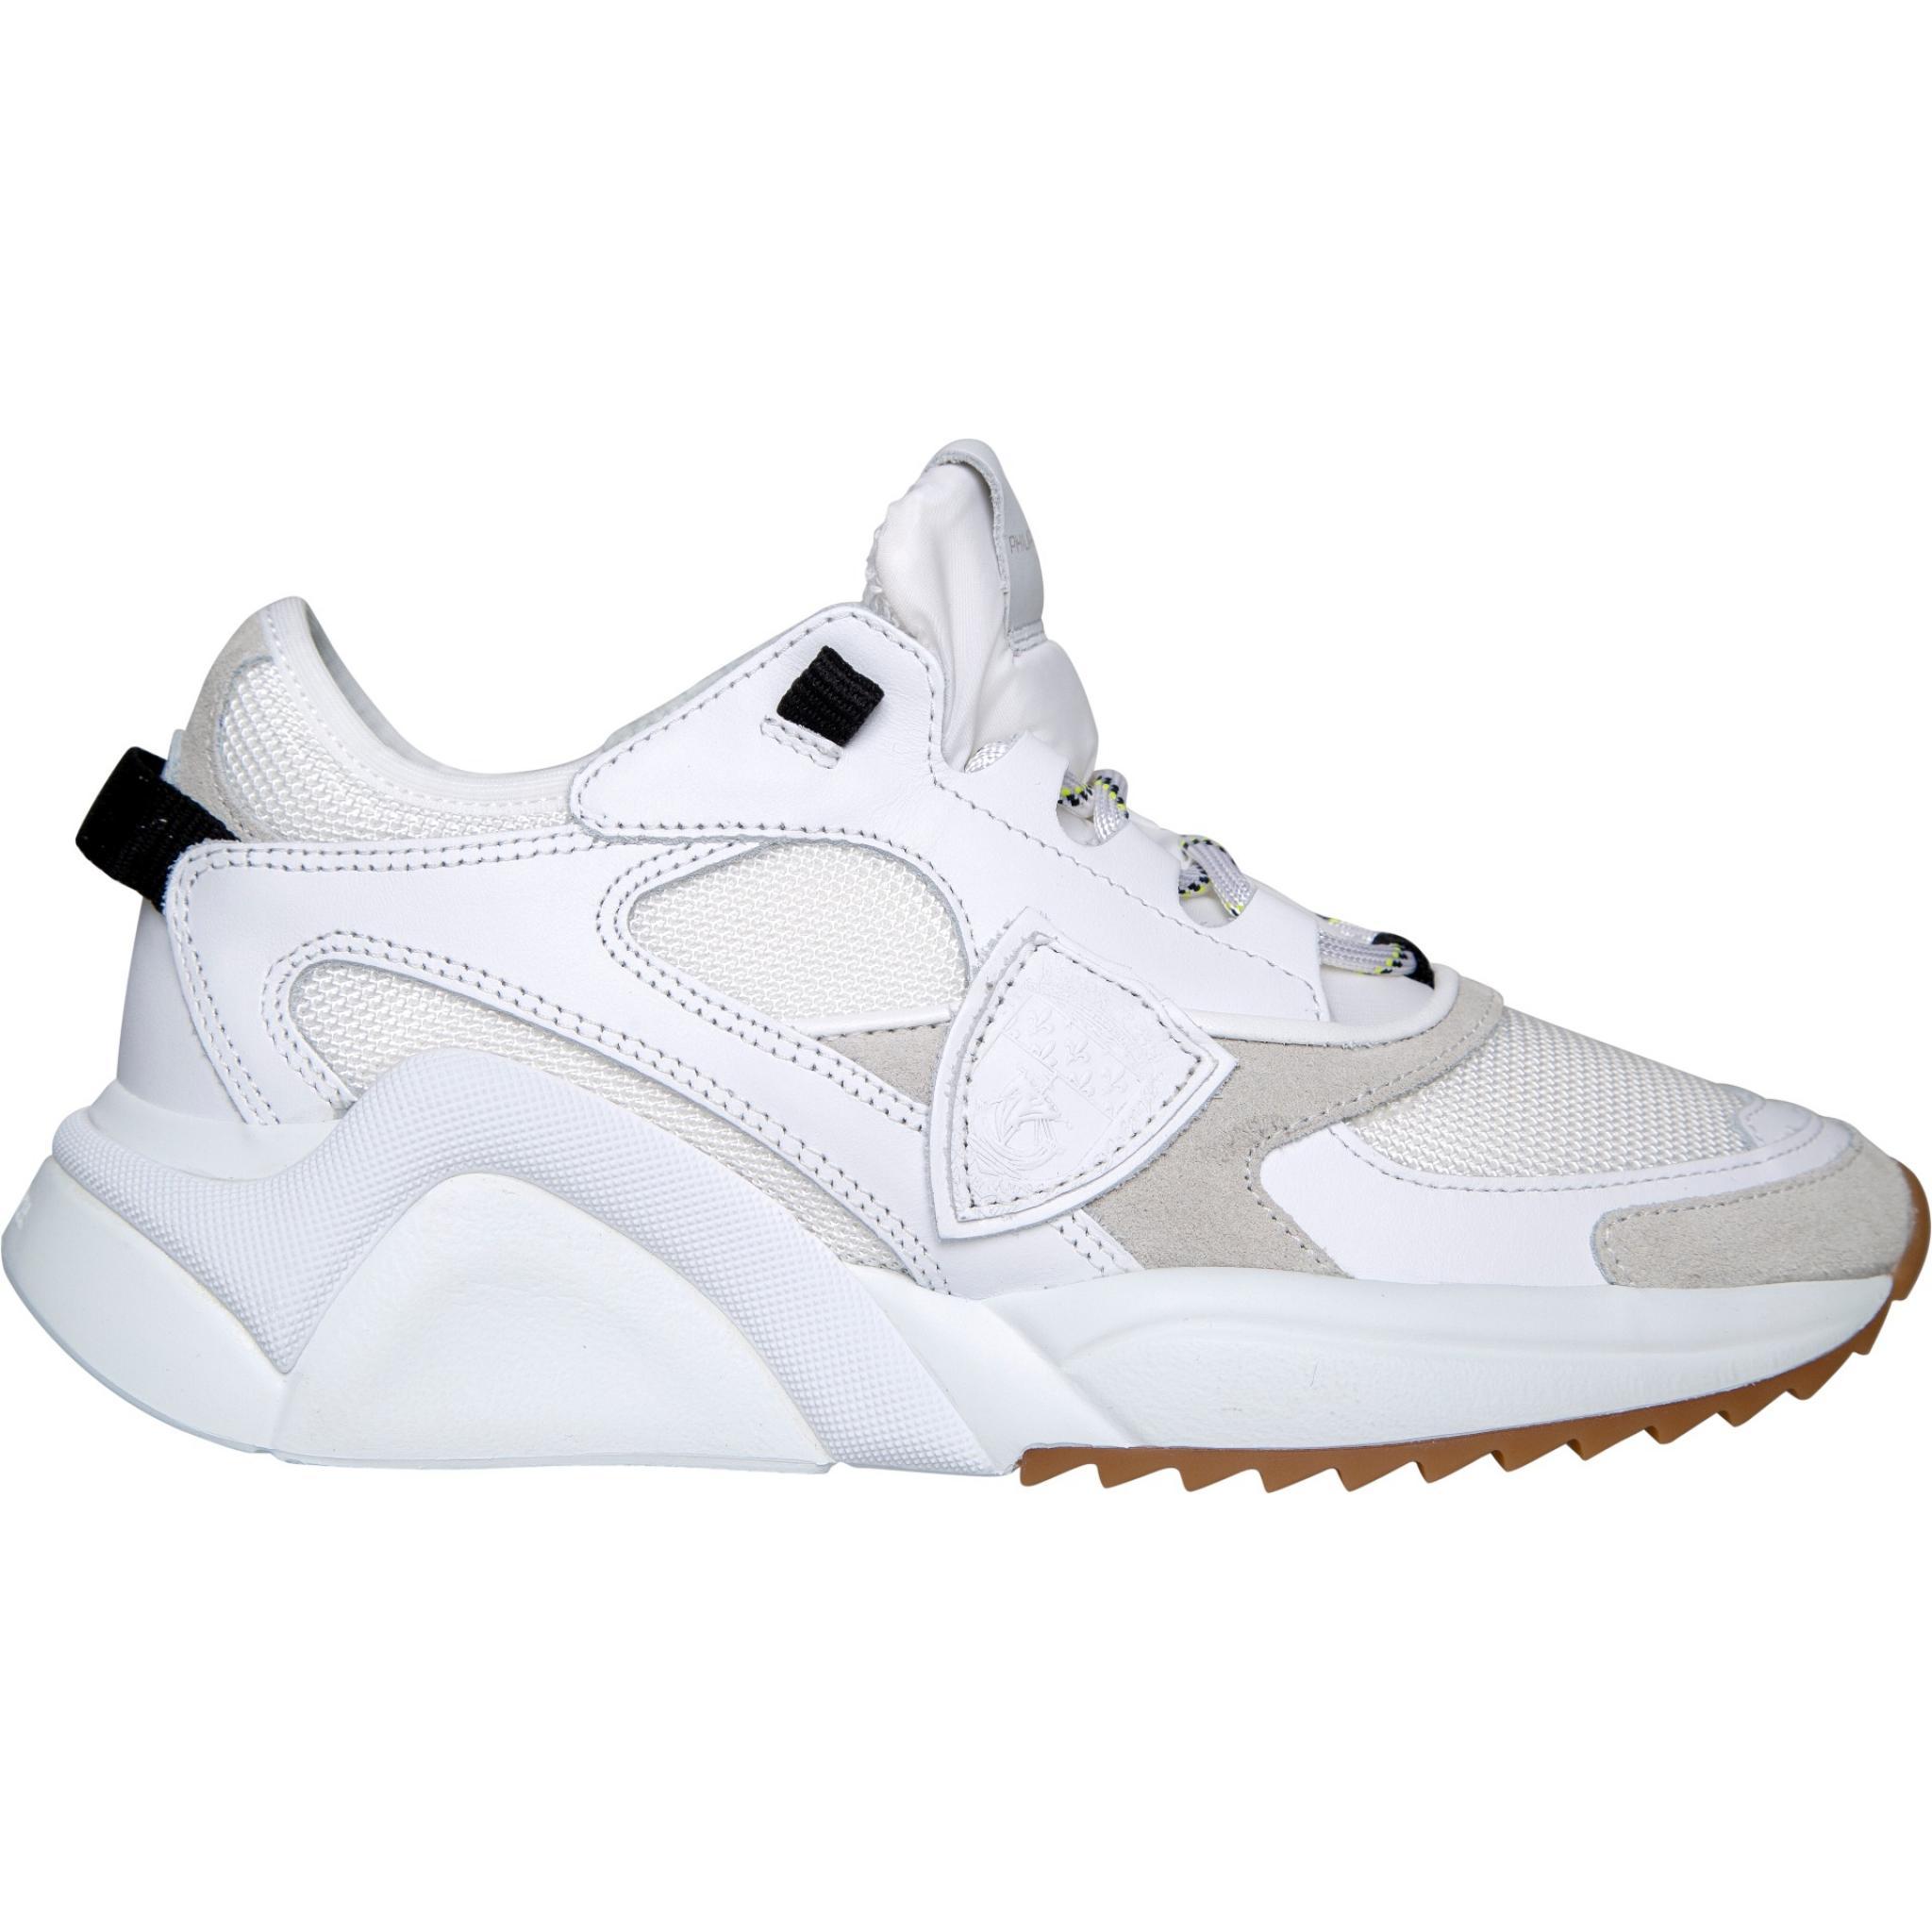 Monochrome Sneakers im Materialmix mit Profilsohle-0